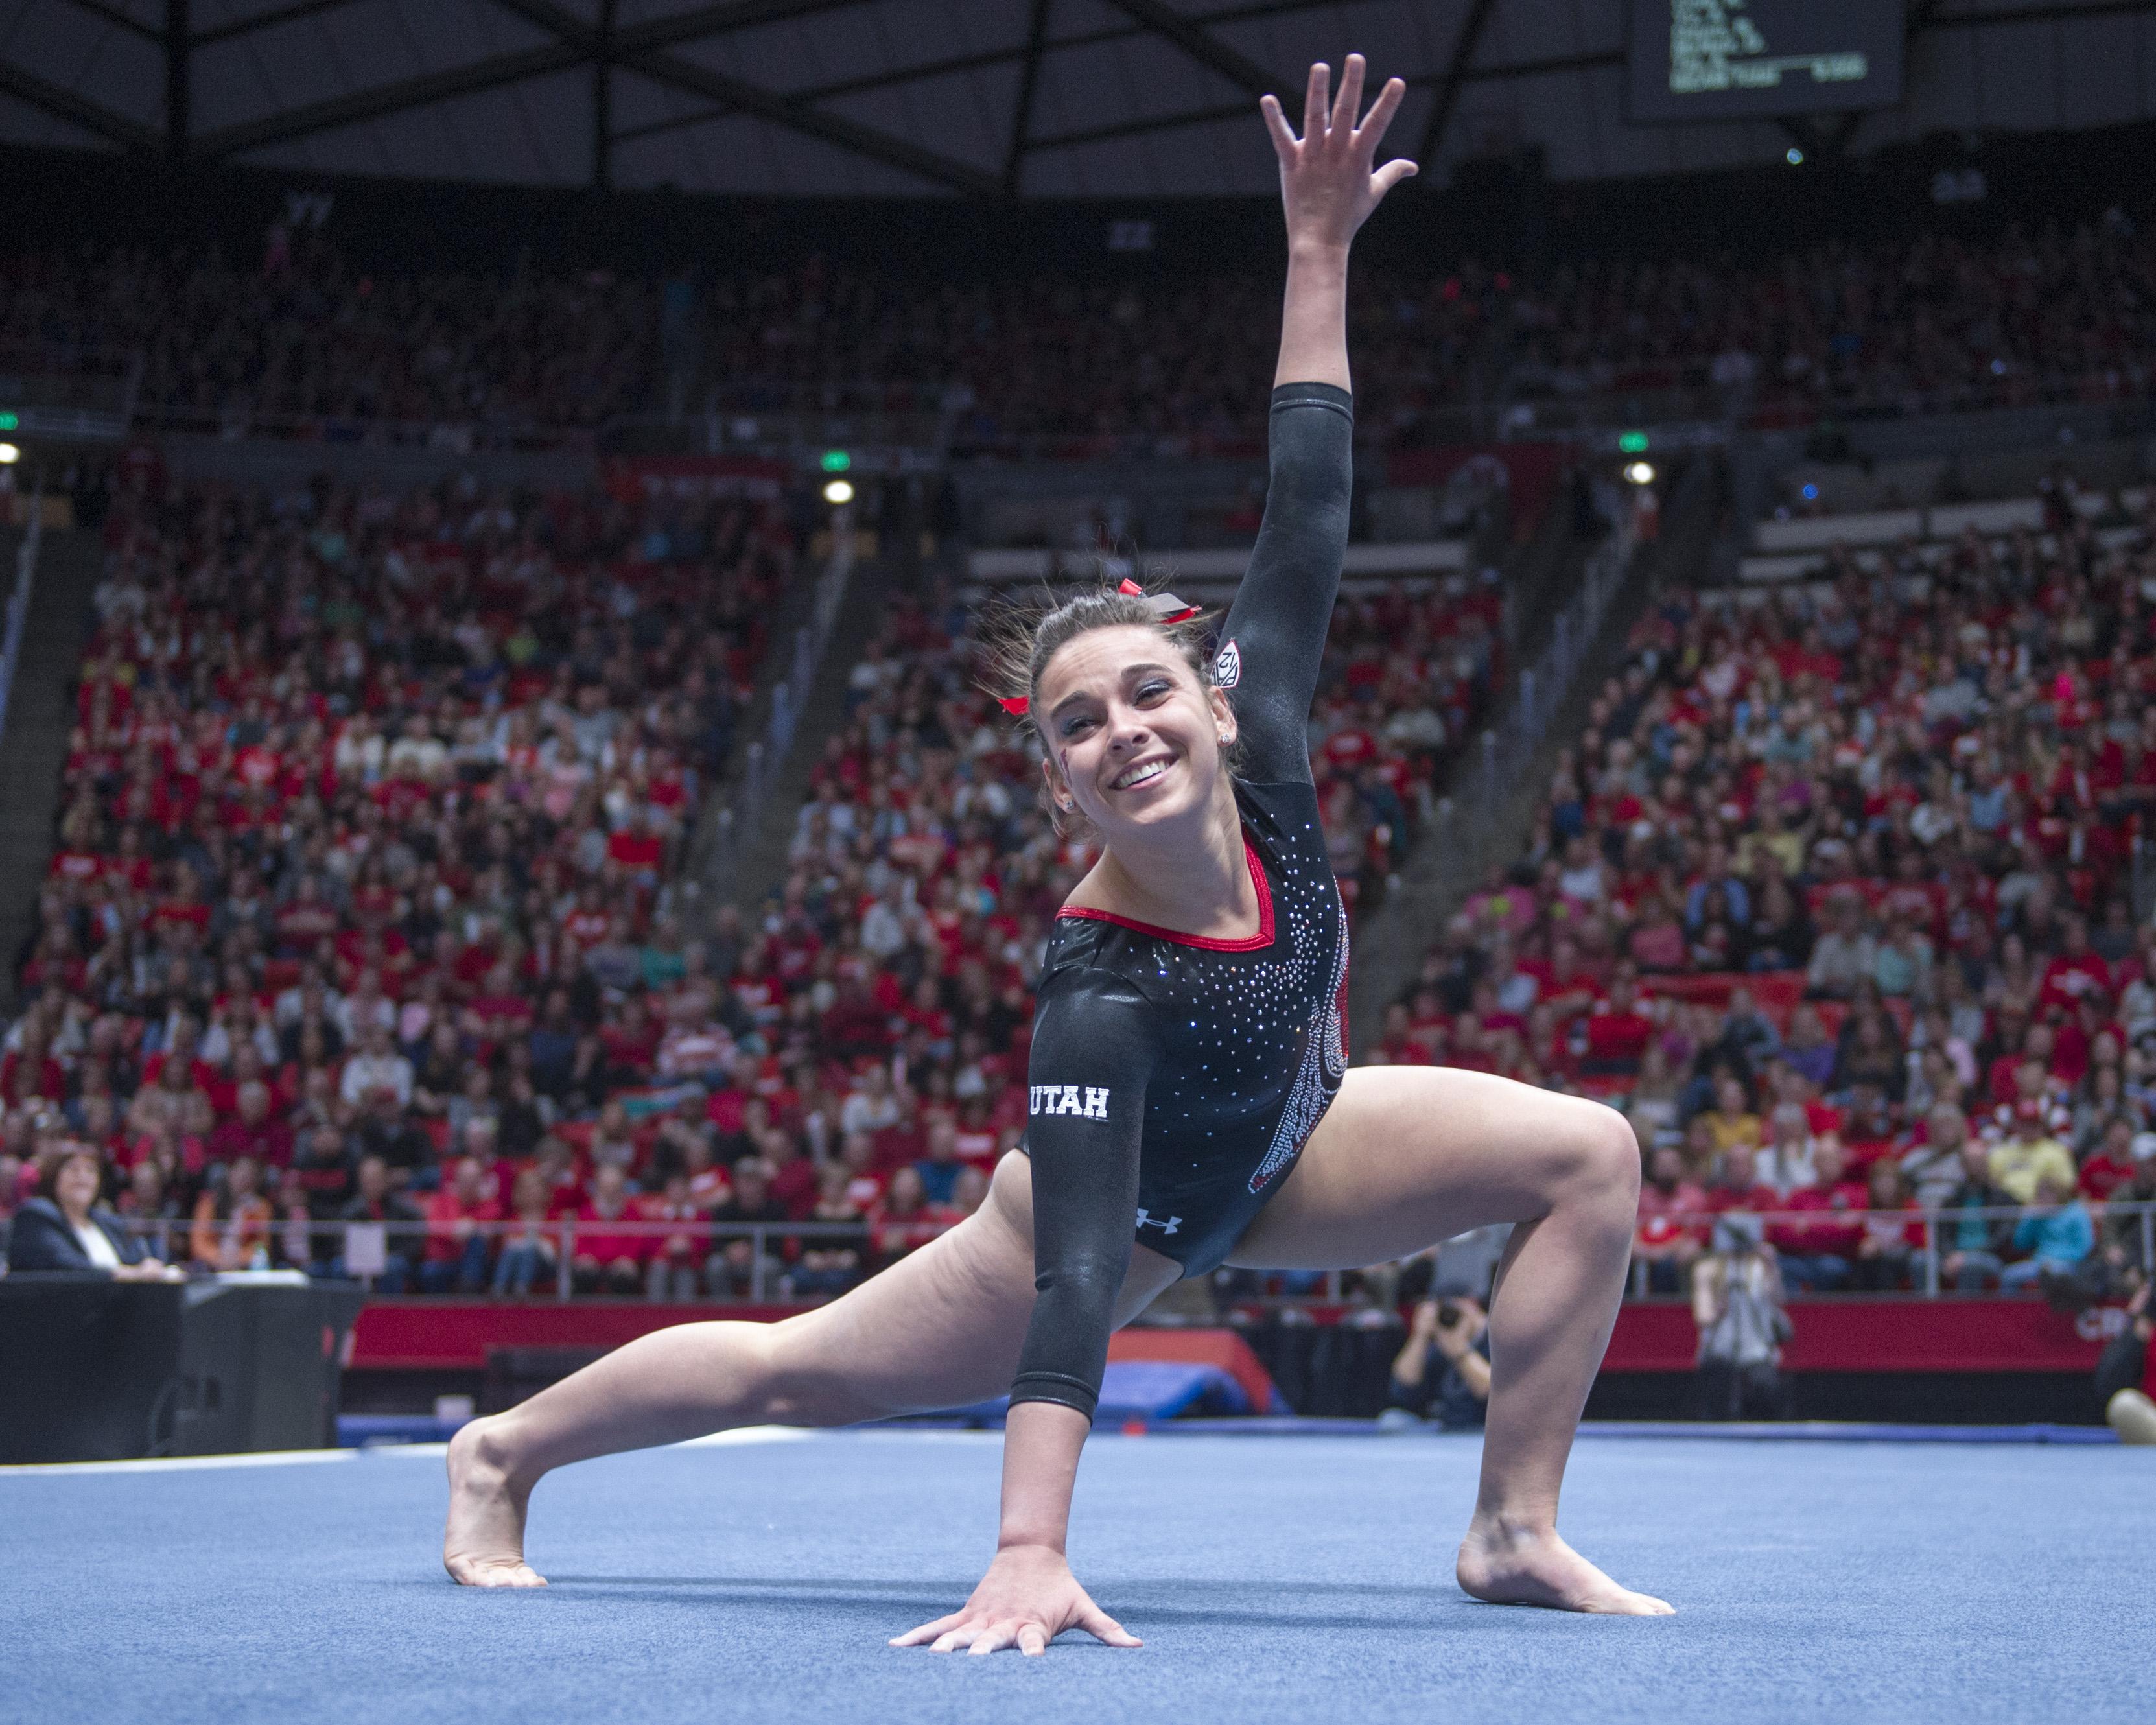 university of utah gymnastics meet